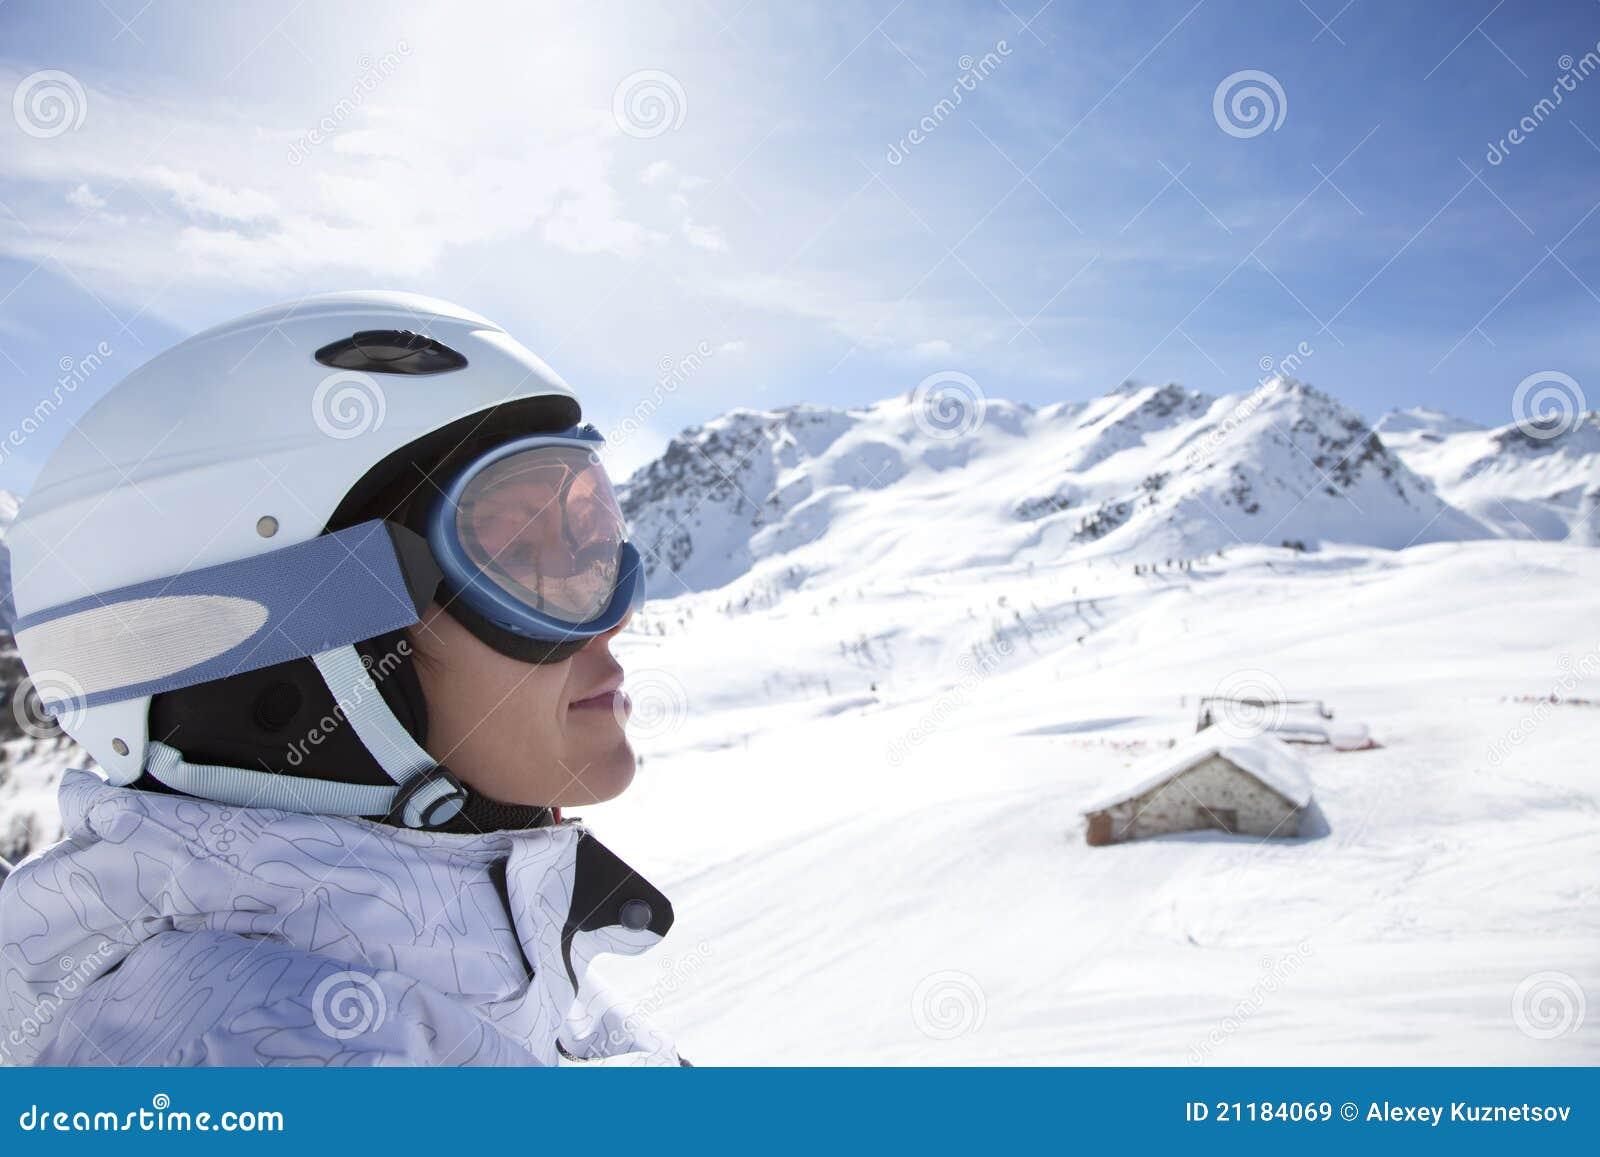 Portrait fo young woman in helmet